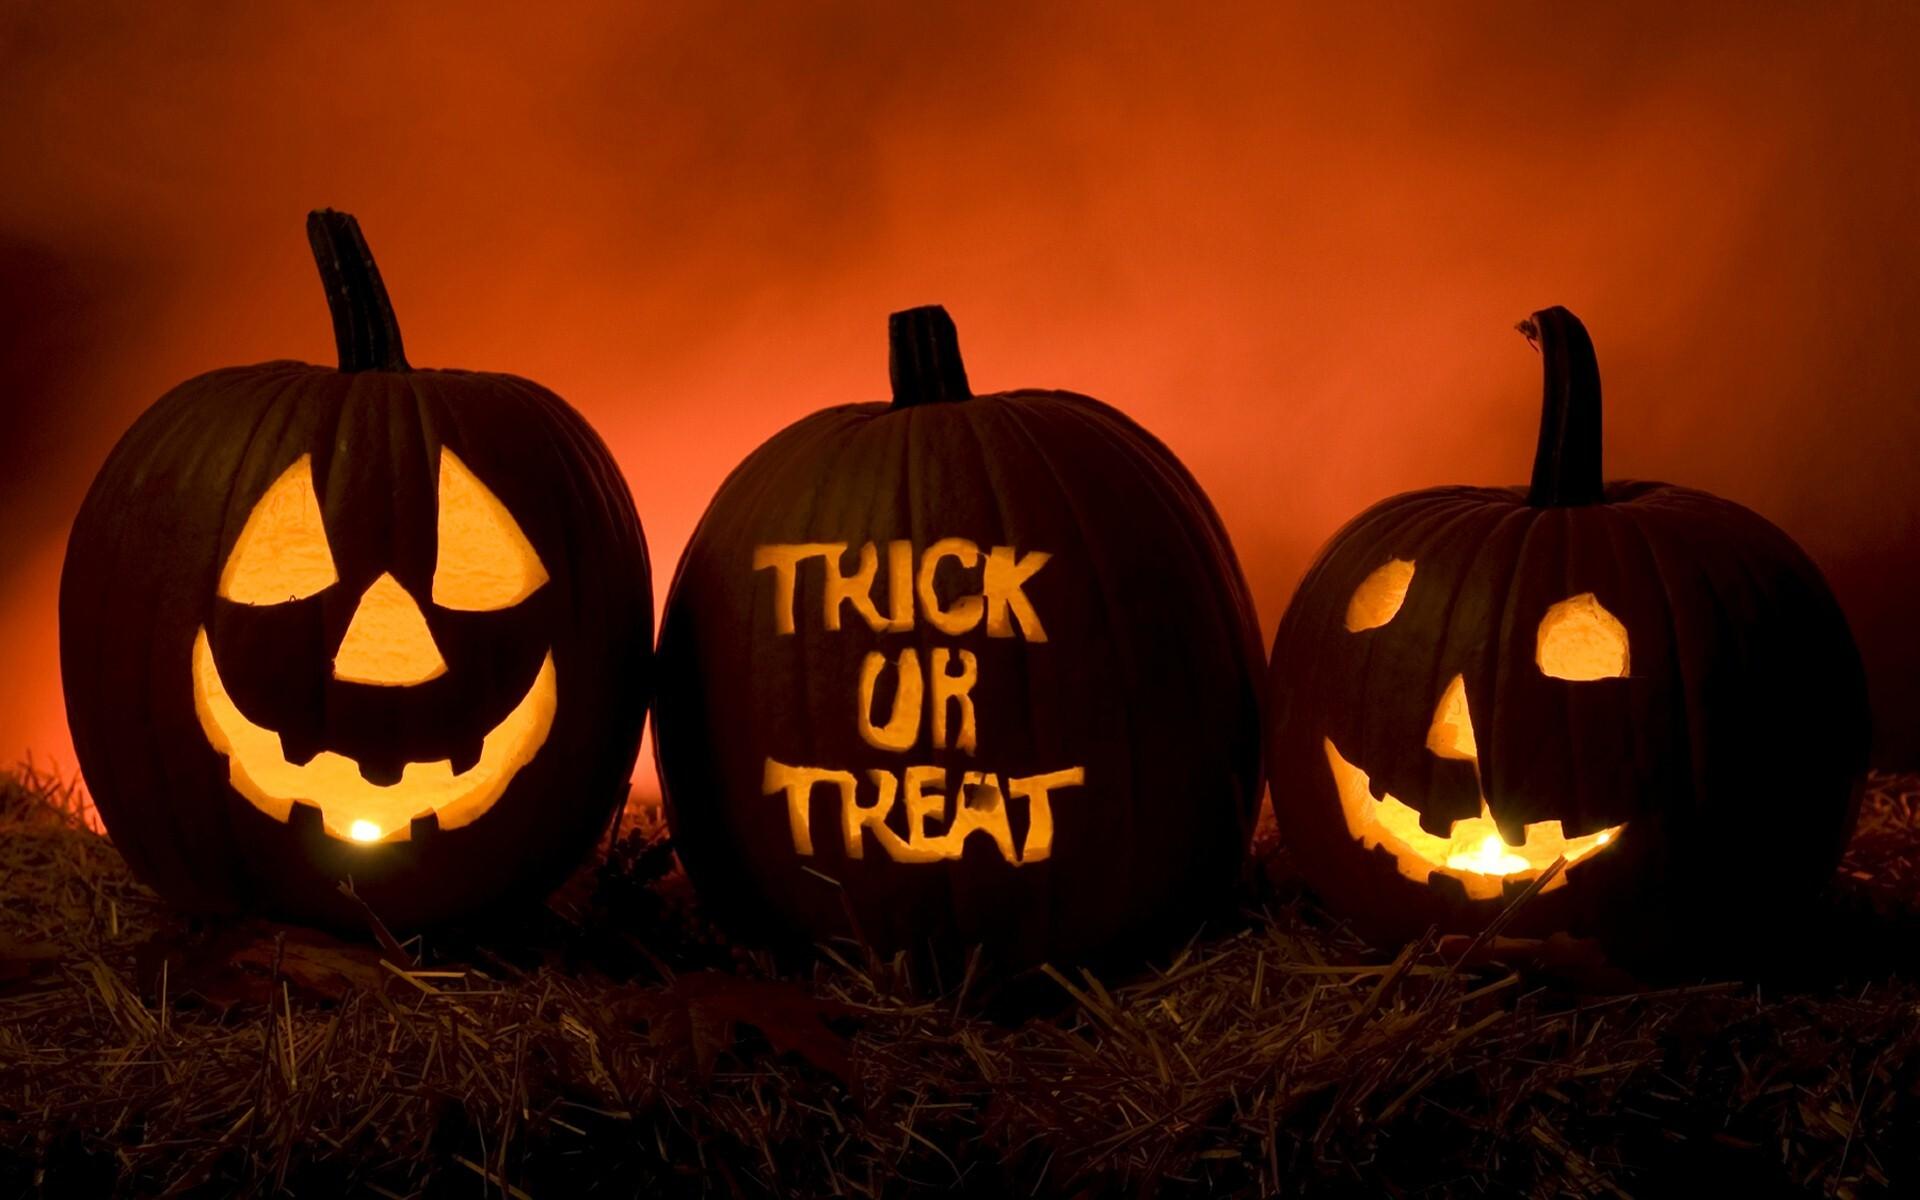 Halloween Background Hd.Trick Or Treat Halloween Festival Hd Wallpaper Desktop